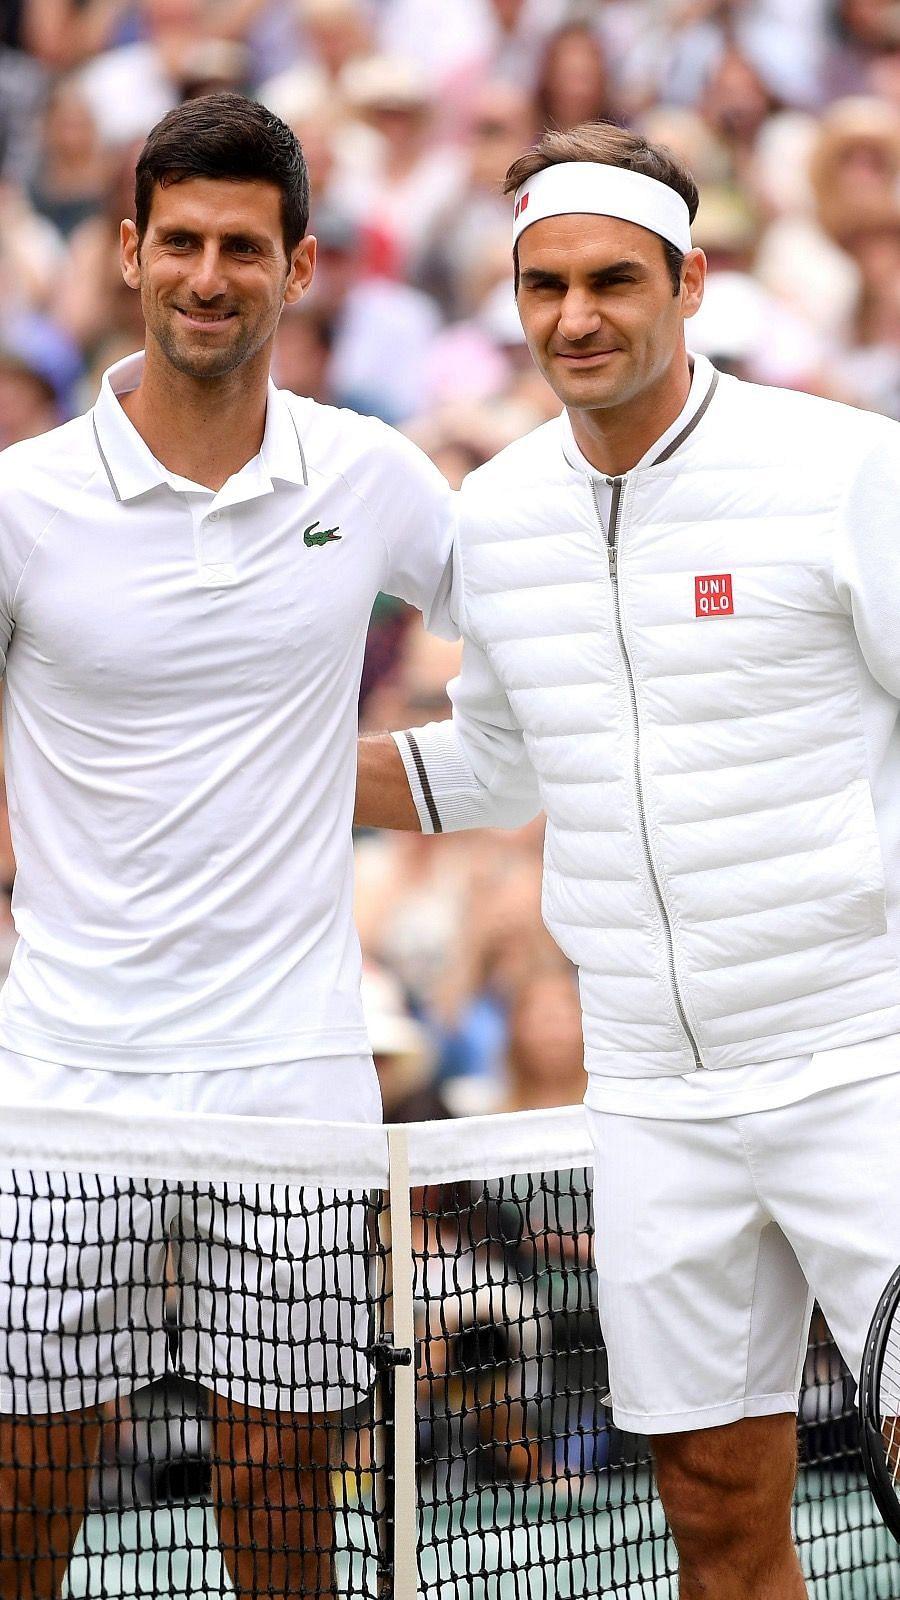 No Chance Roger Federer Would Be Disqualified Like Novak Djokovic Nikola Pilic